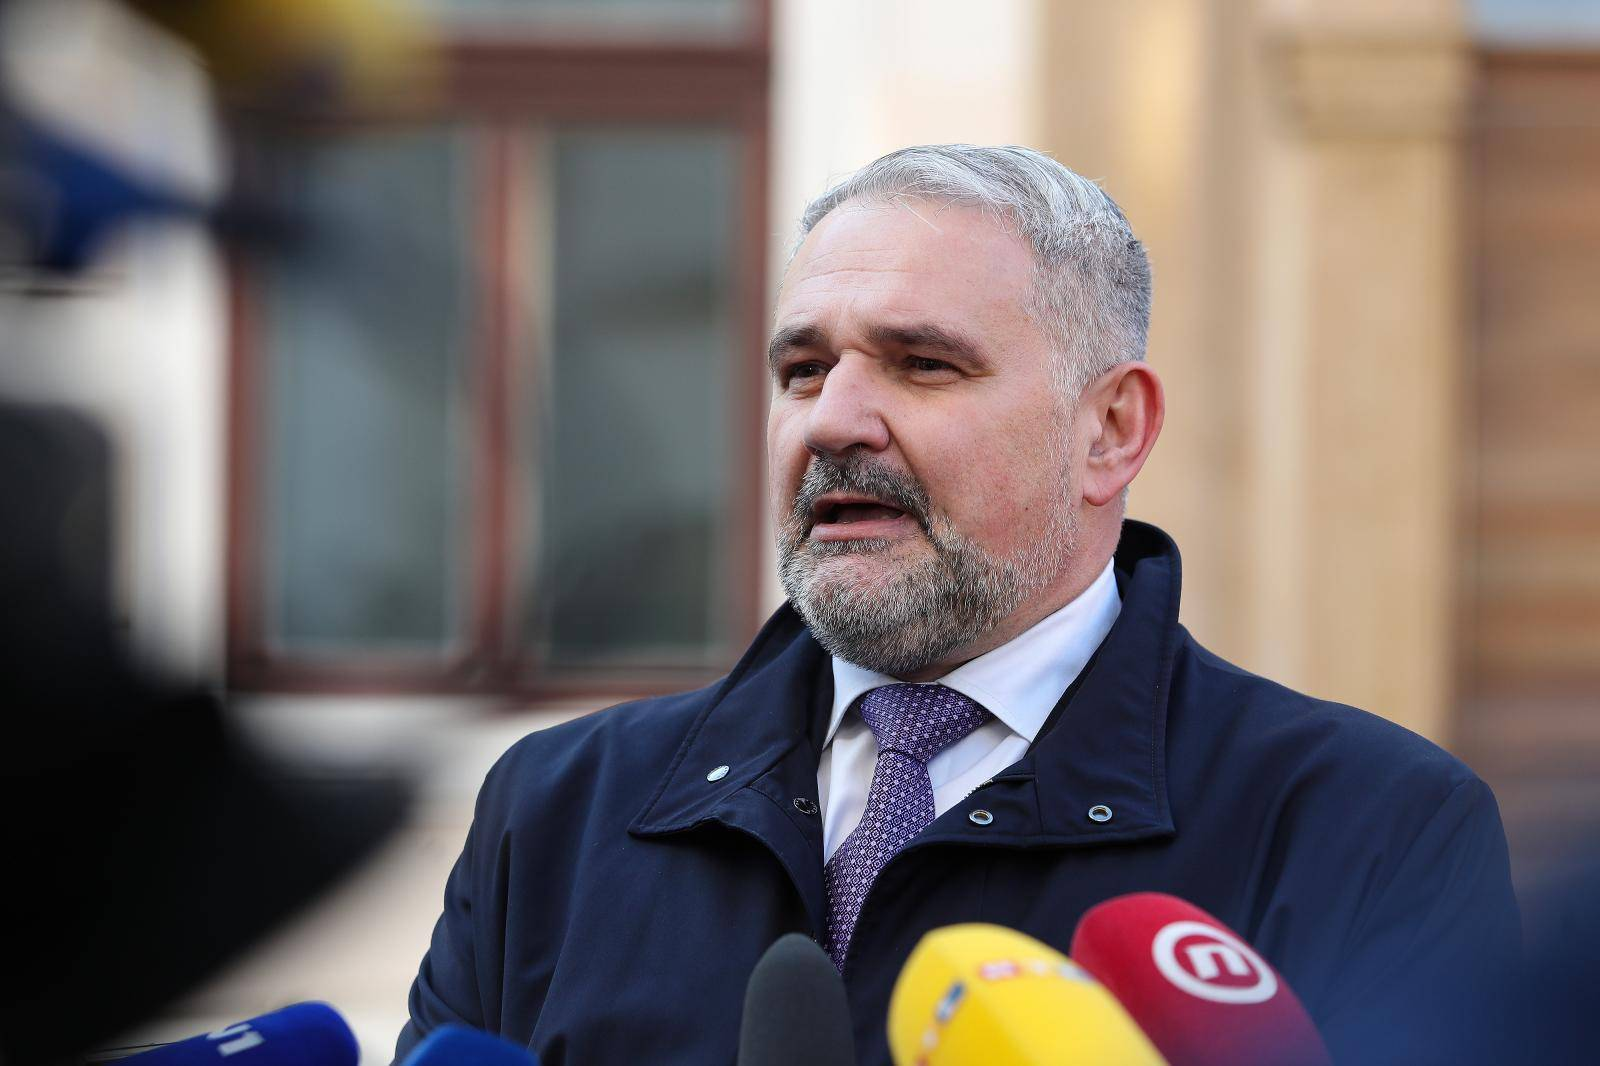 Gospodarstvenici dolaze na sastanak u Banske dvore s predsjednikom Vlade Andrejom Plenkovićem